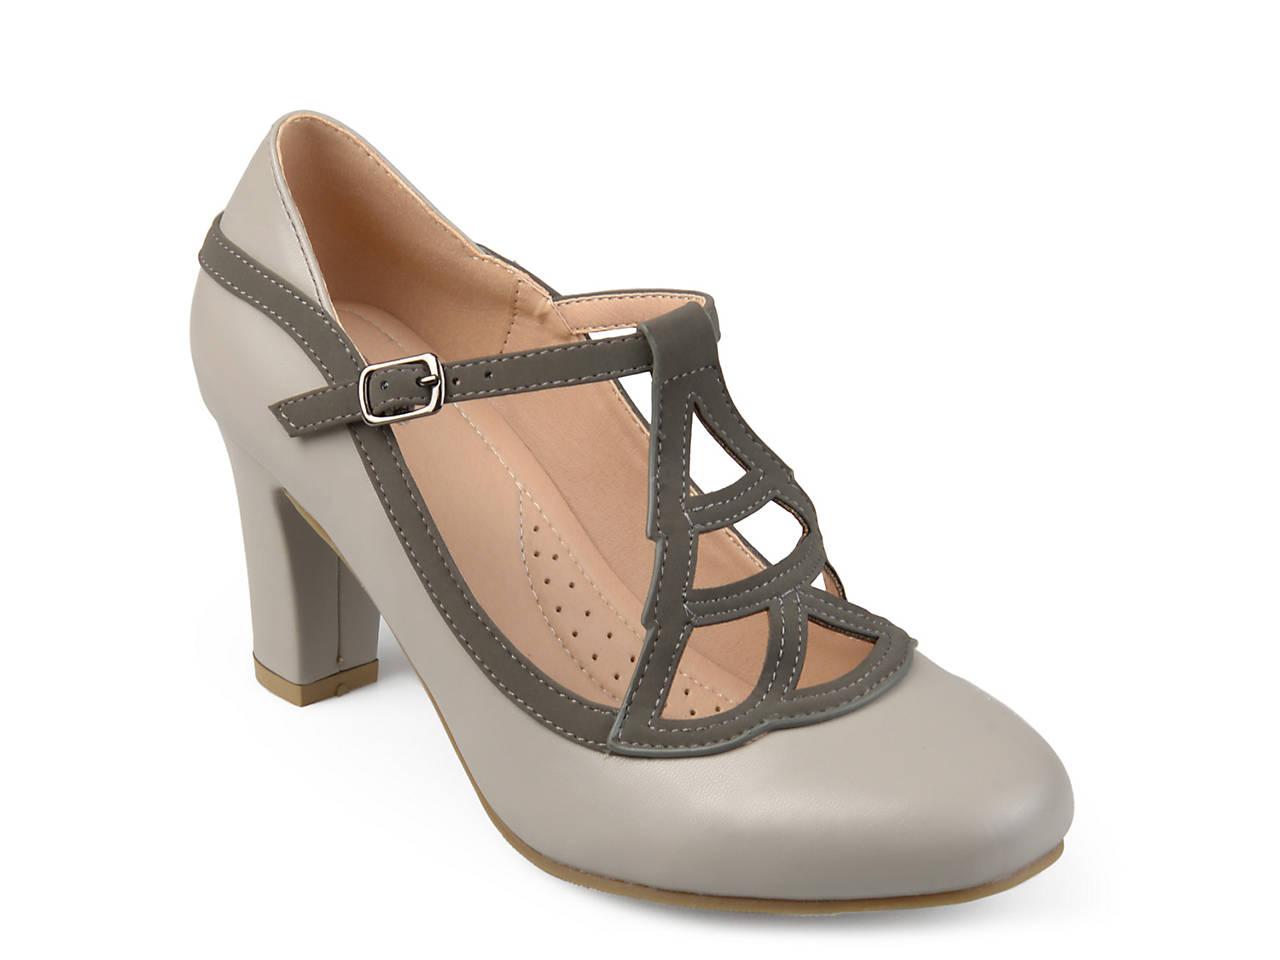 6cfc0f171441 Journee Collection Nile Pump Women s Shoes